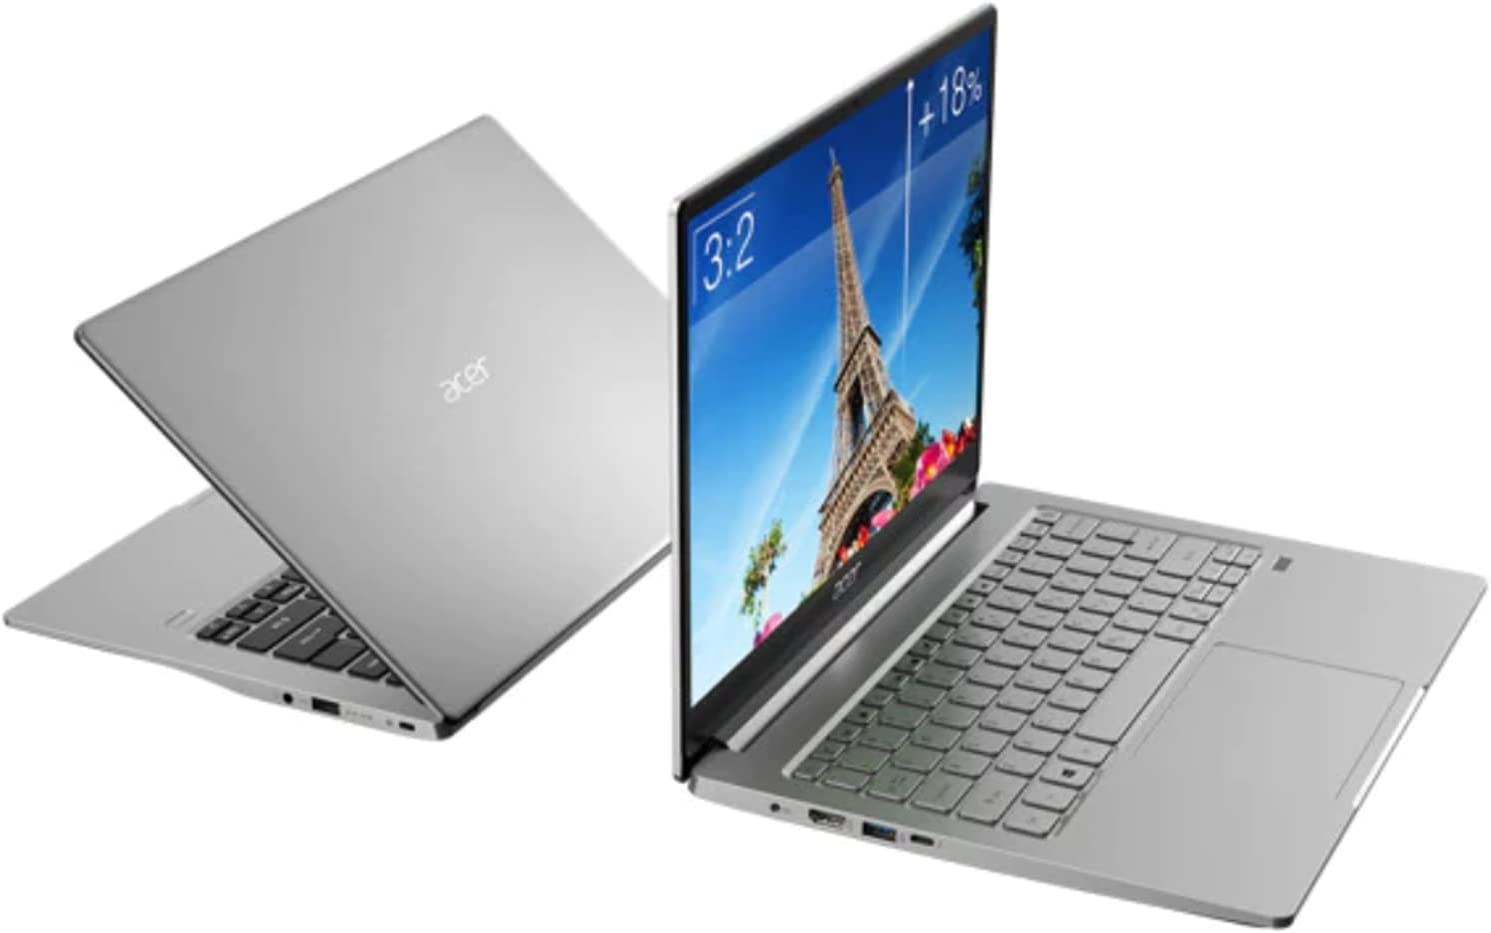 Acer Swift 3 Slim and Light Laptop|13.5